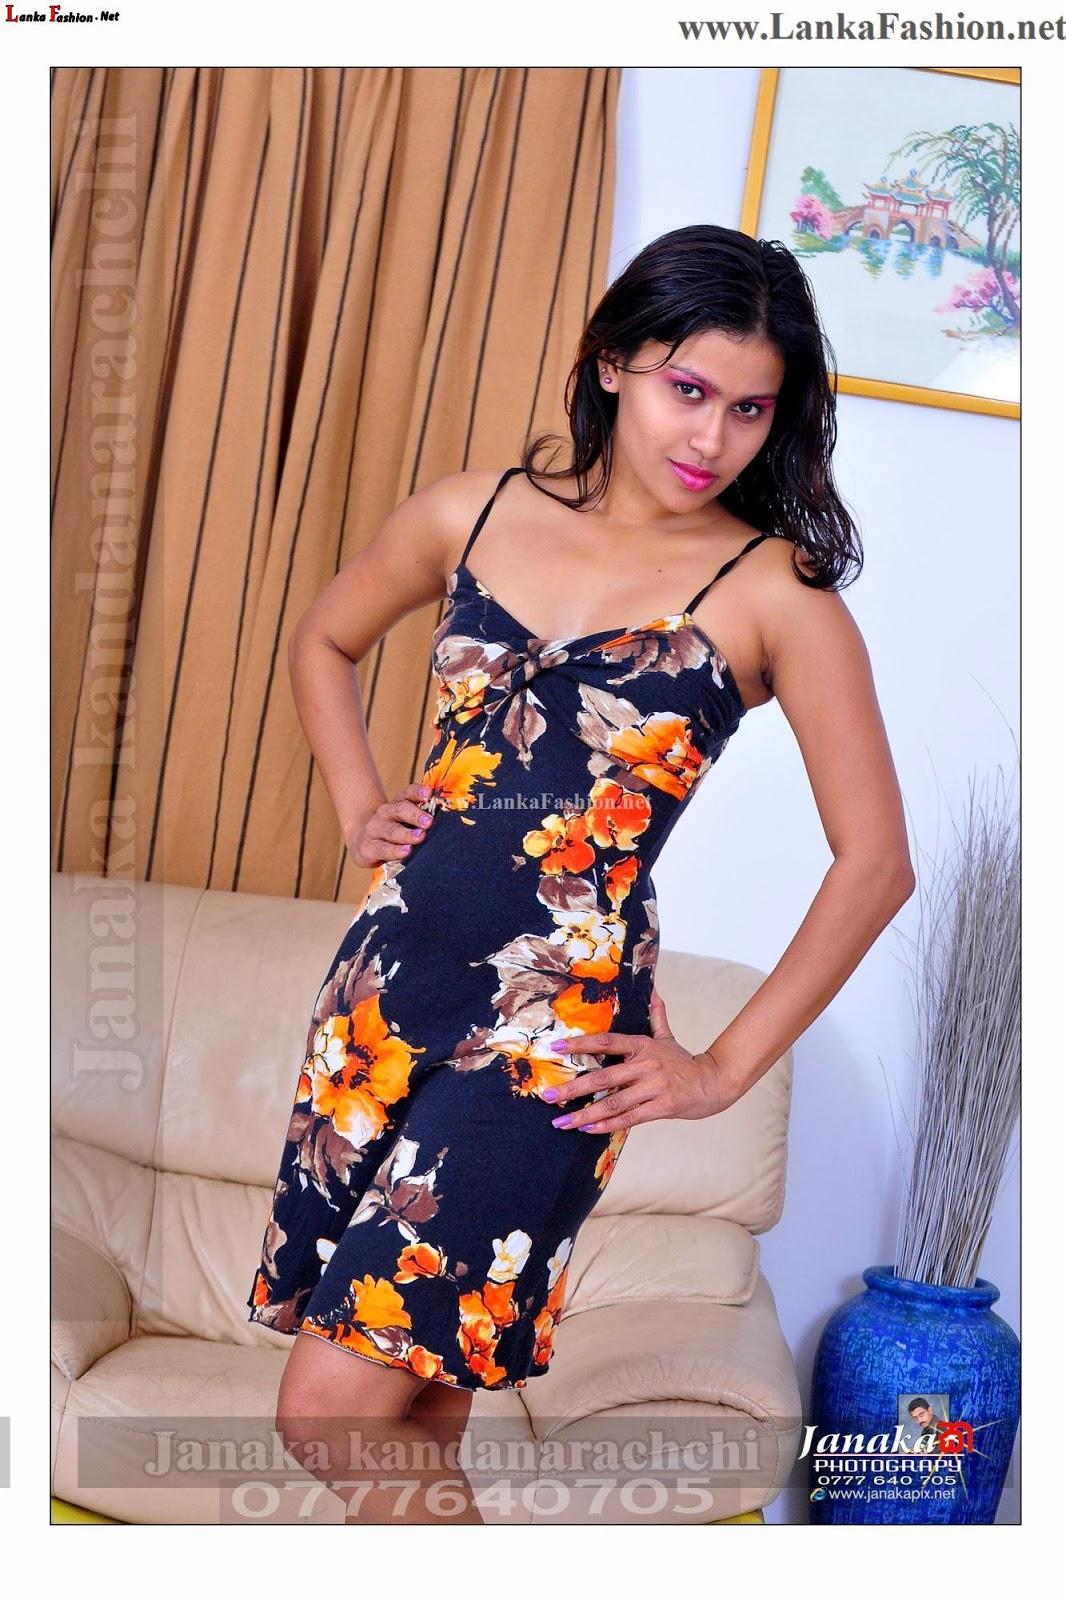 Chathu Paba Dilhara sri lankan model